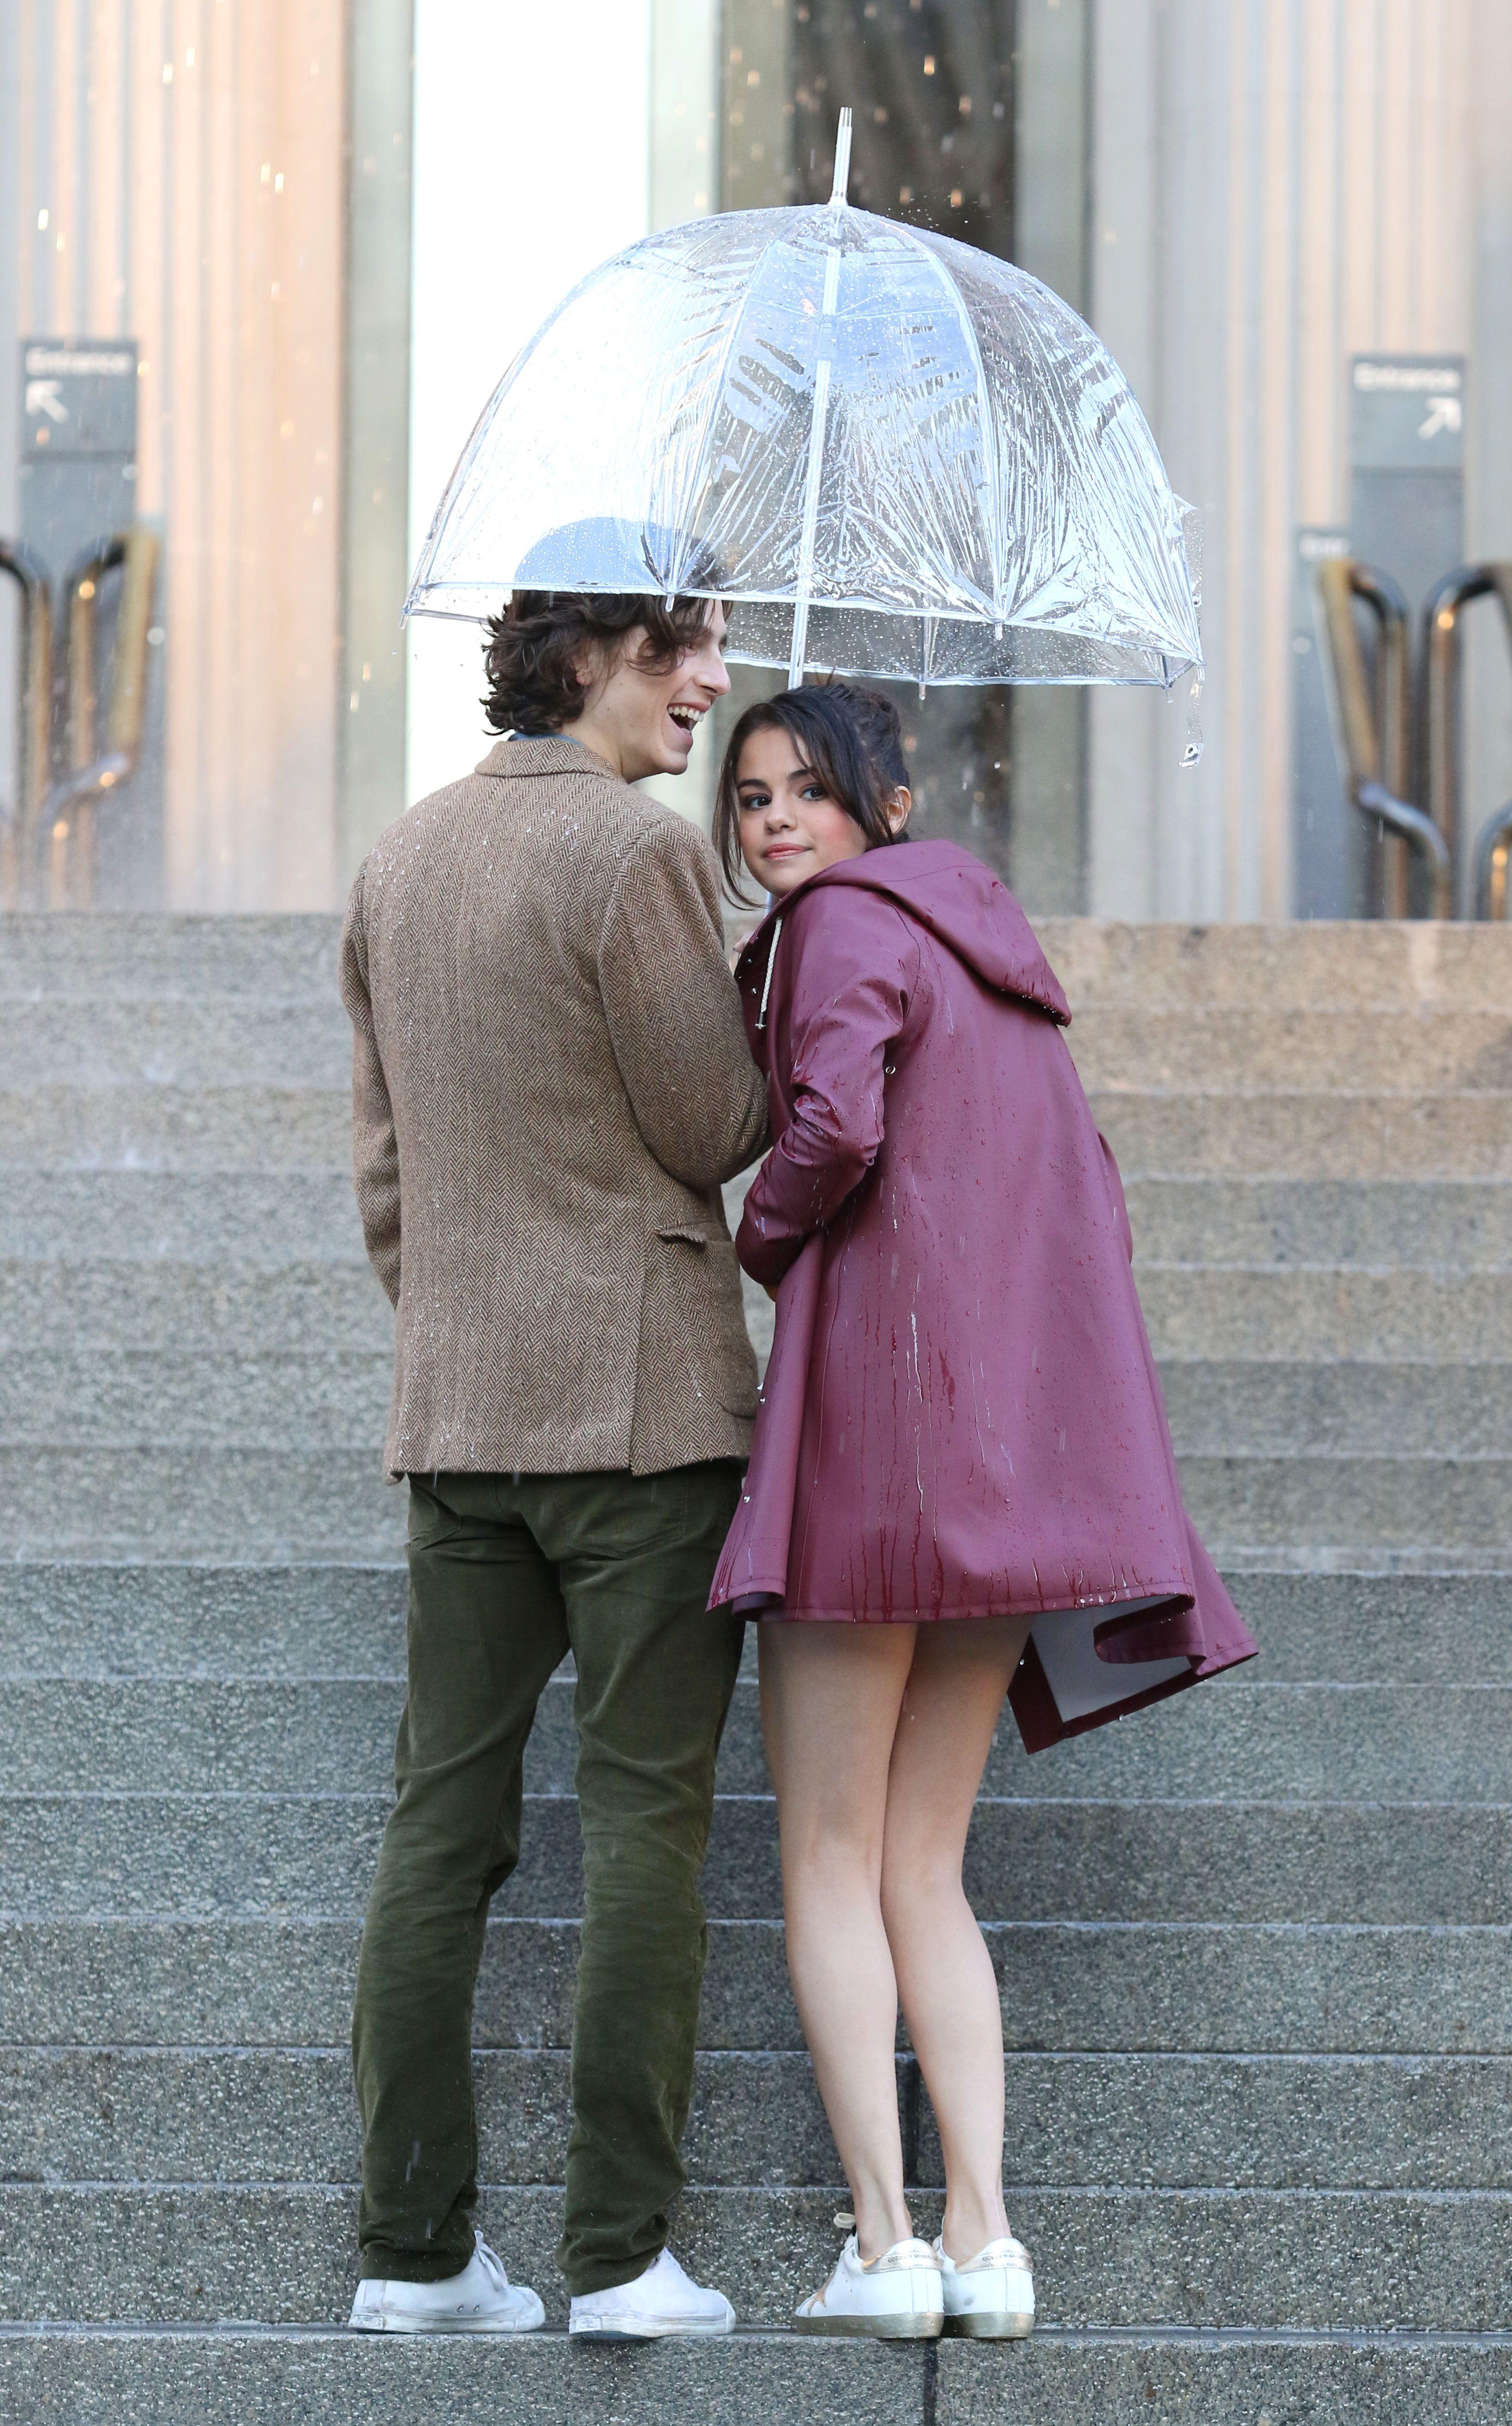 Selena Gomez On the set of Woody Allen film in NYC 10/03